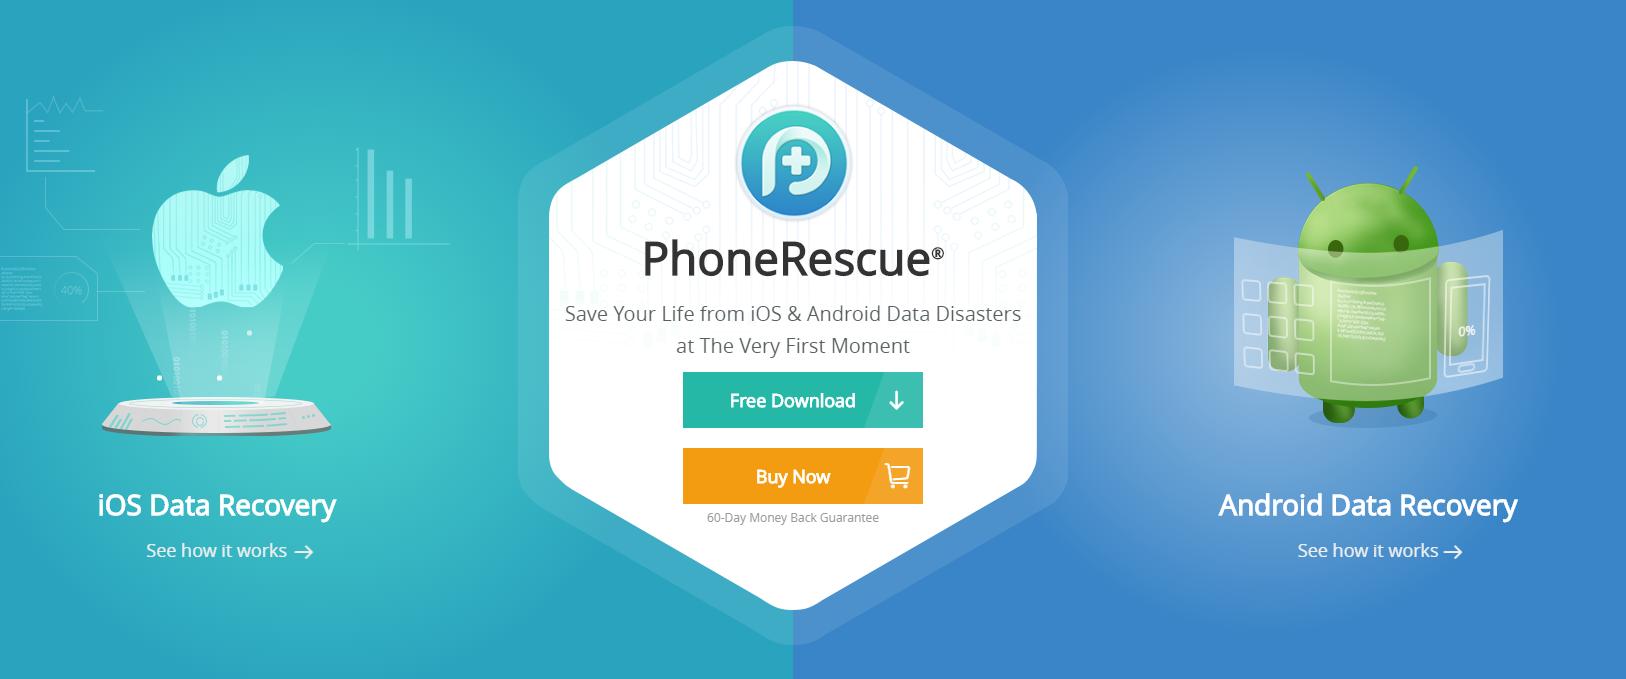 PhoneRescur Website